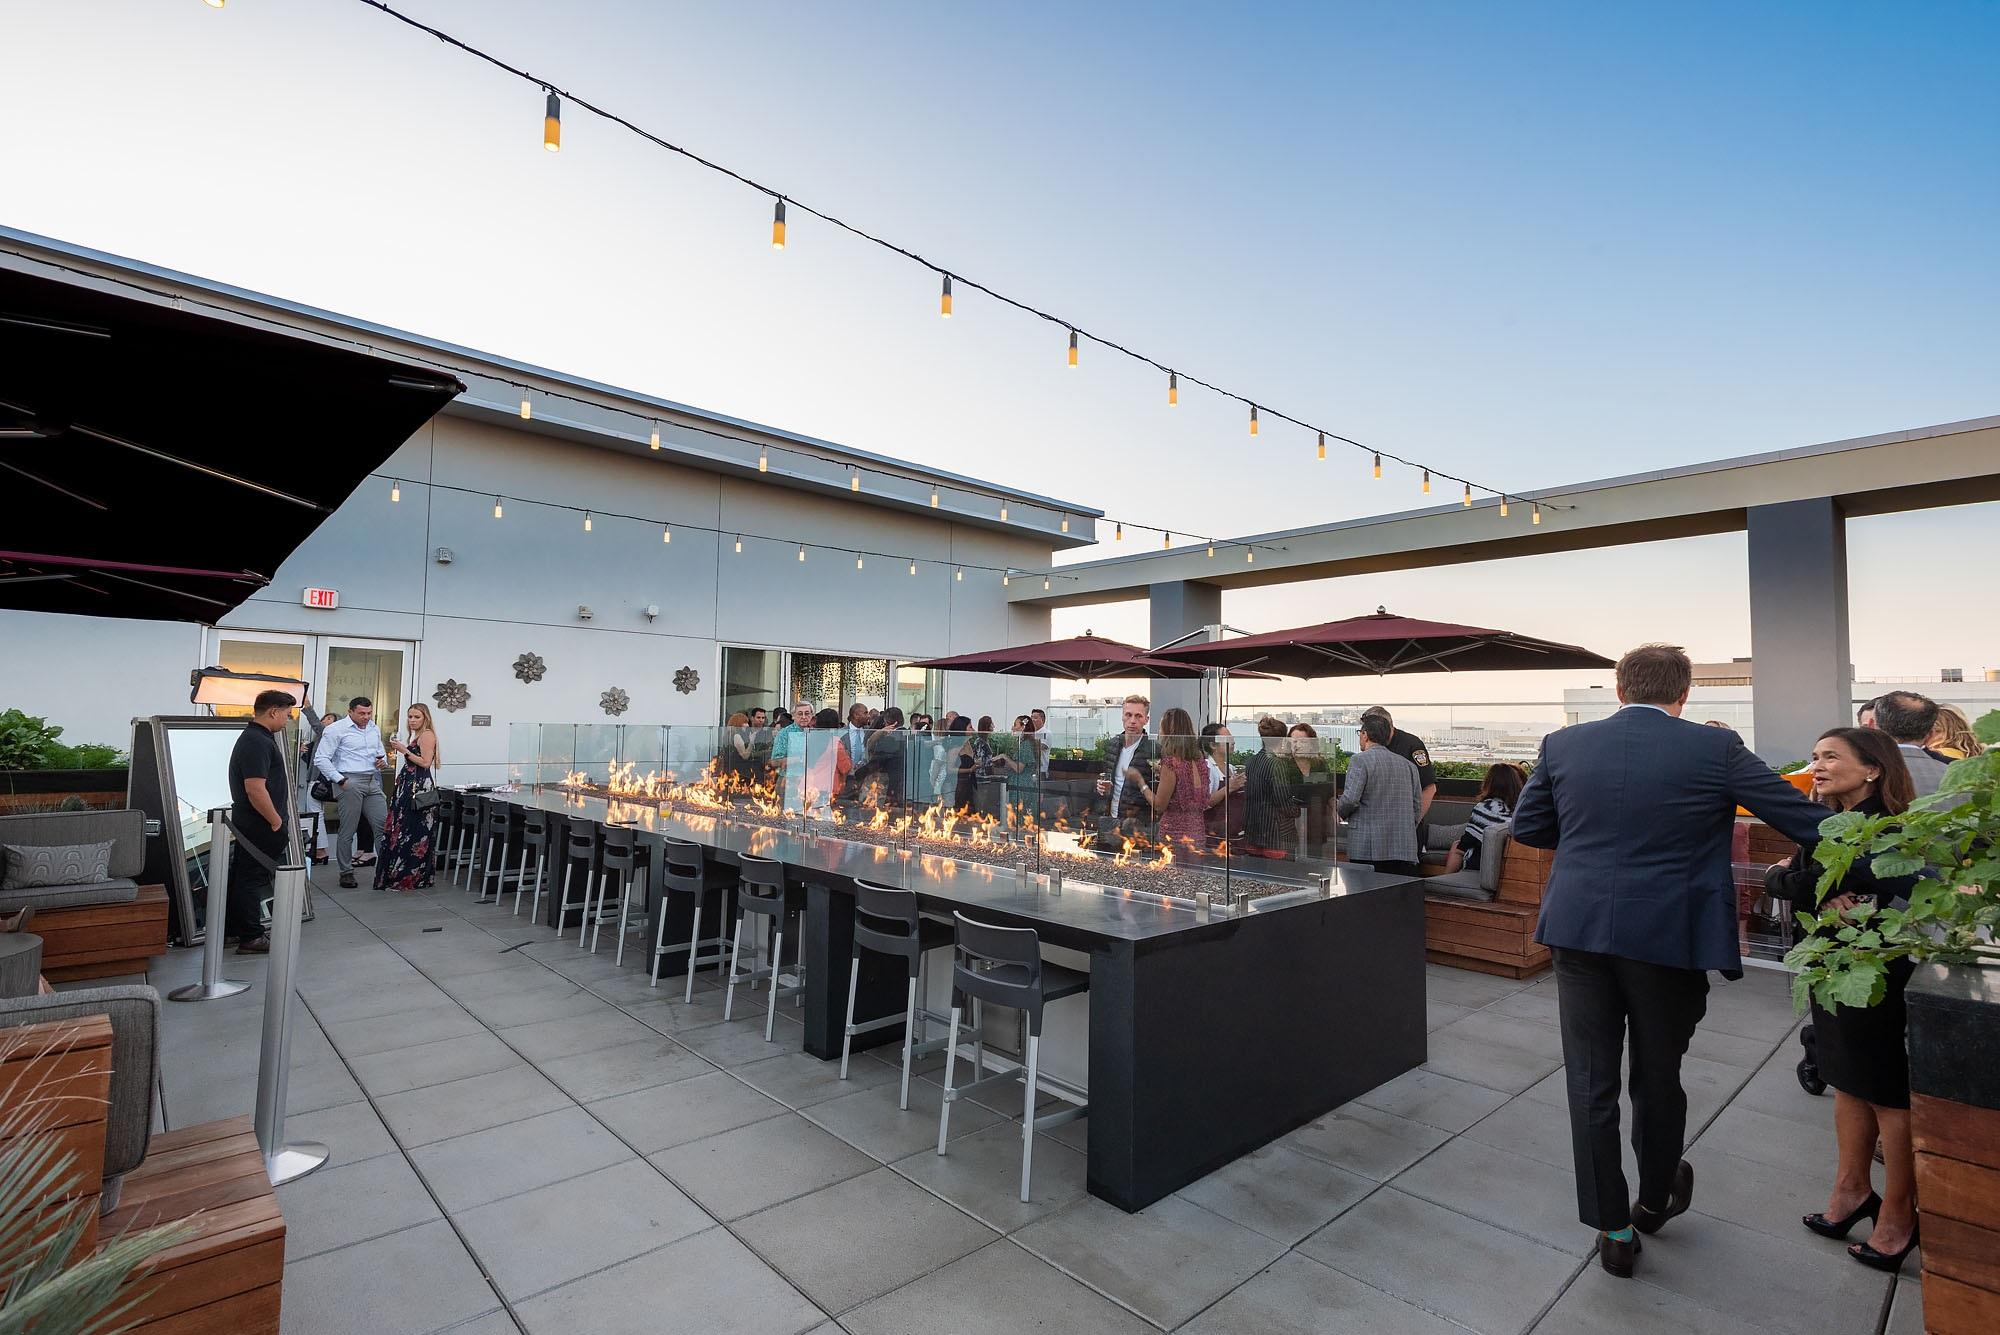 Swanky New Hotel Rooftop Bar Comes to Corporate-Heavy El Segundo